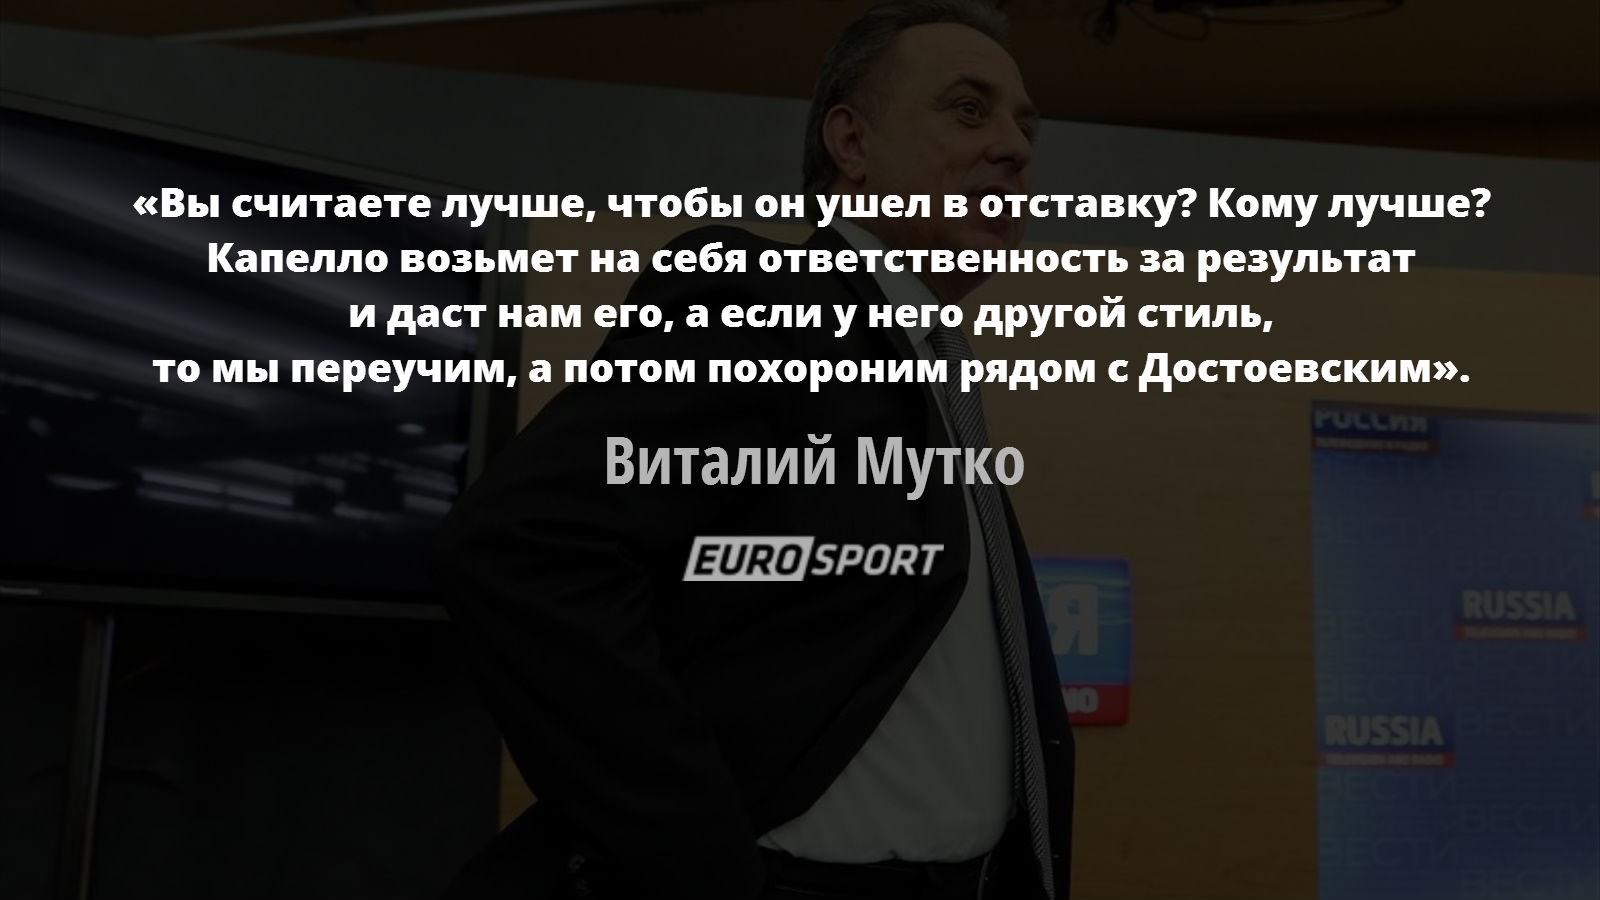 https://i.eurosport.com/2015/07/13/1639214.jpg